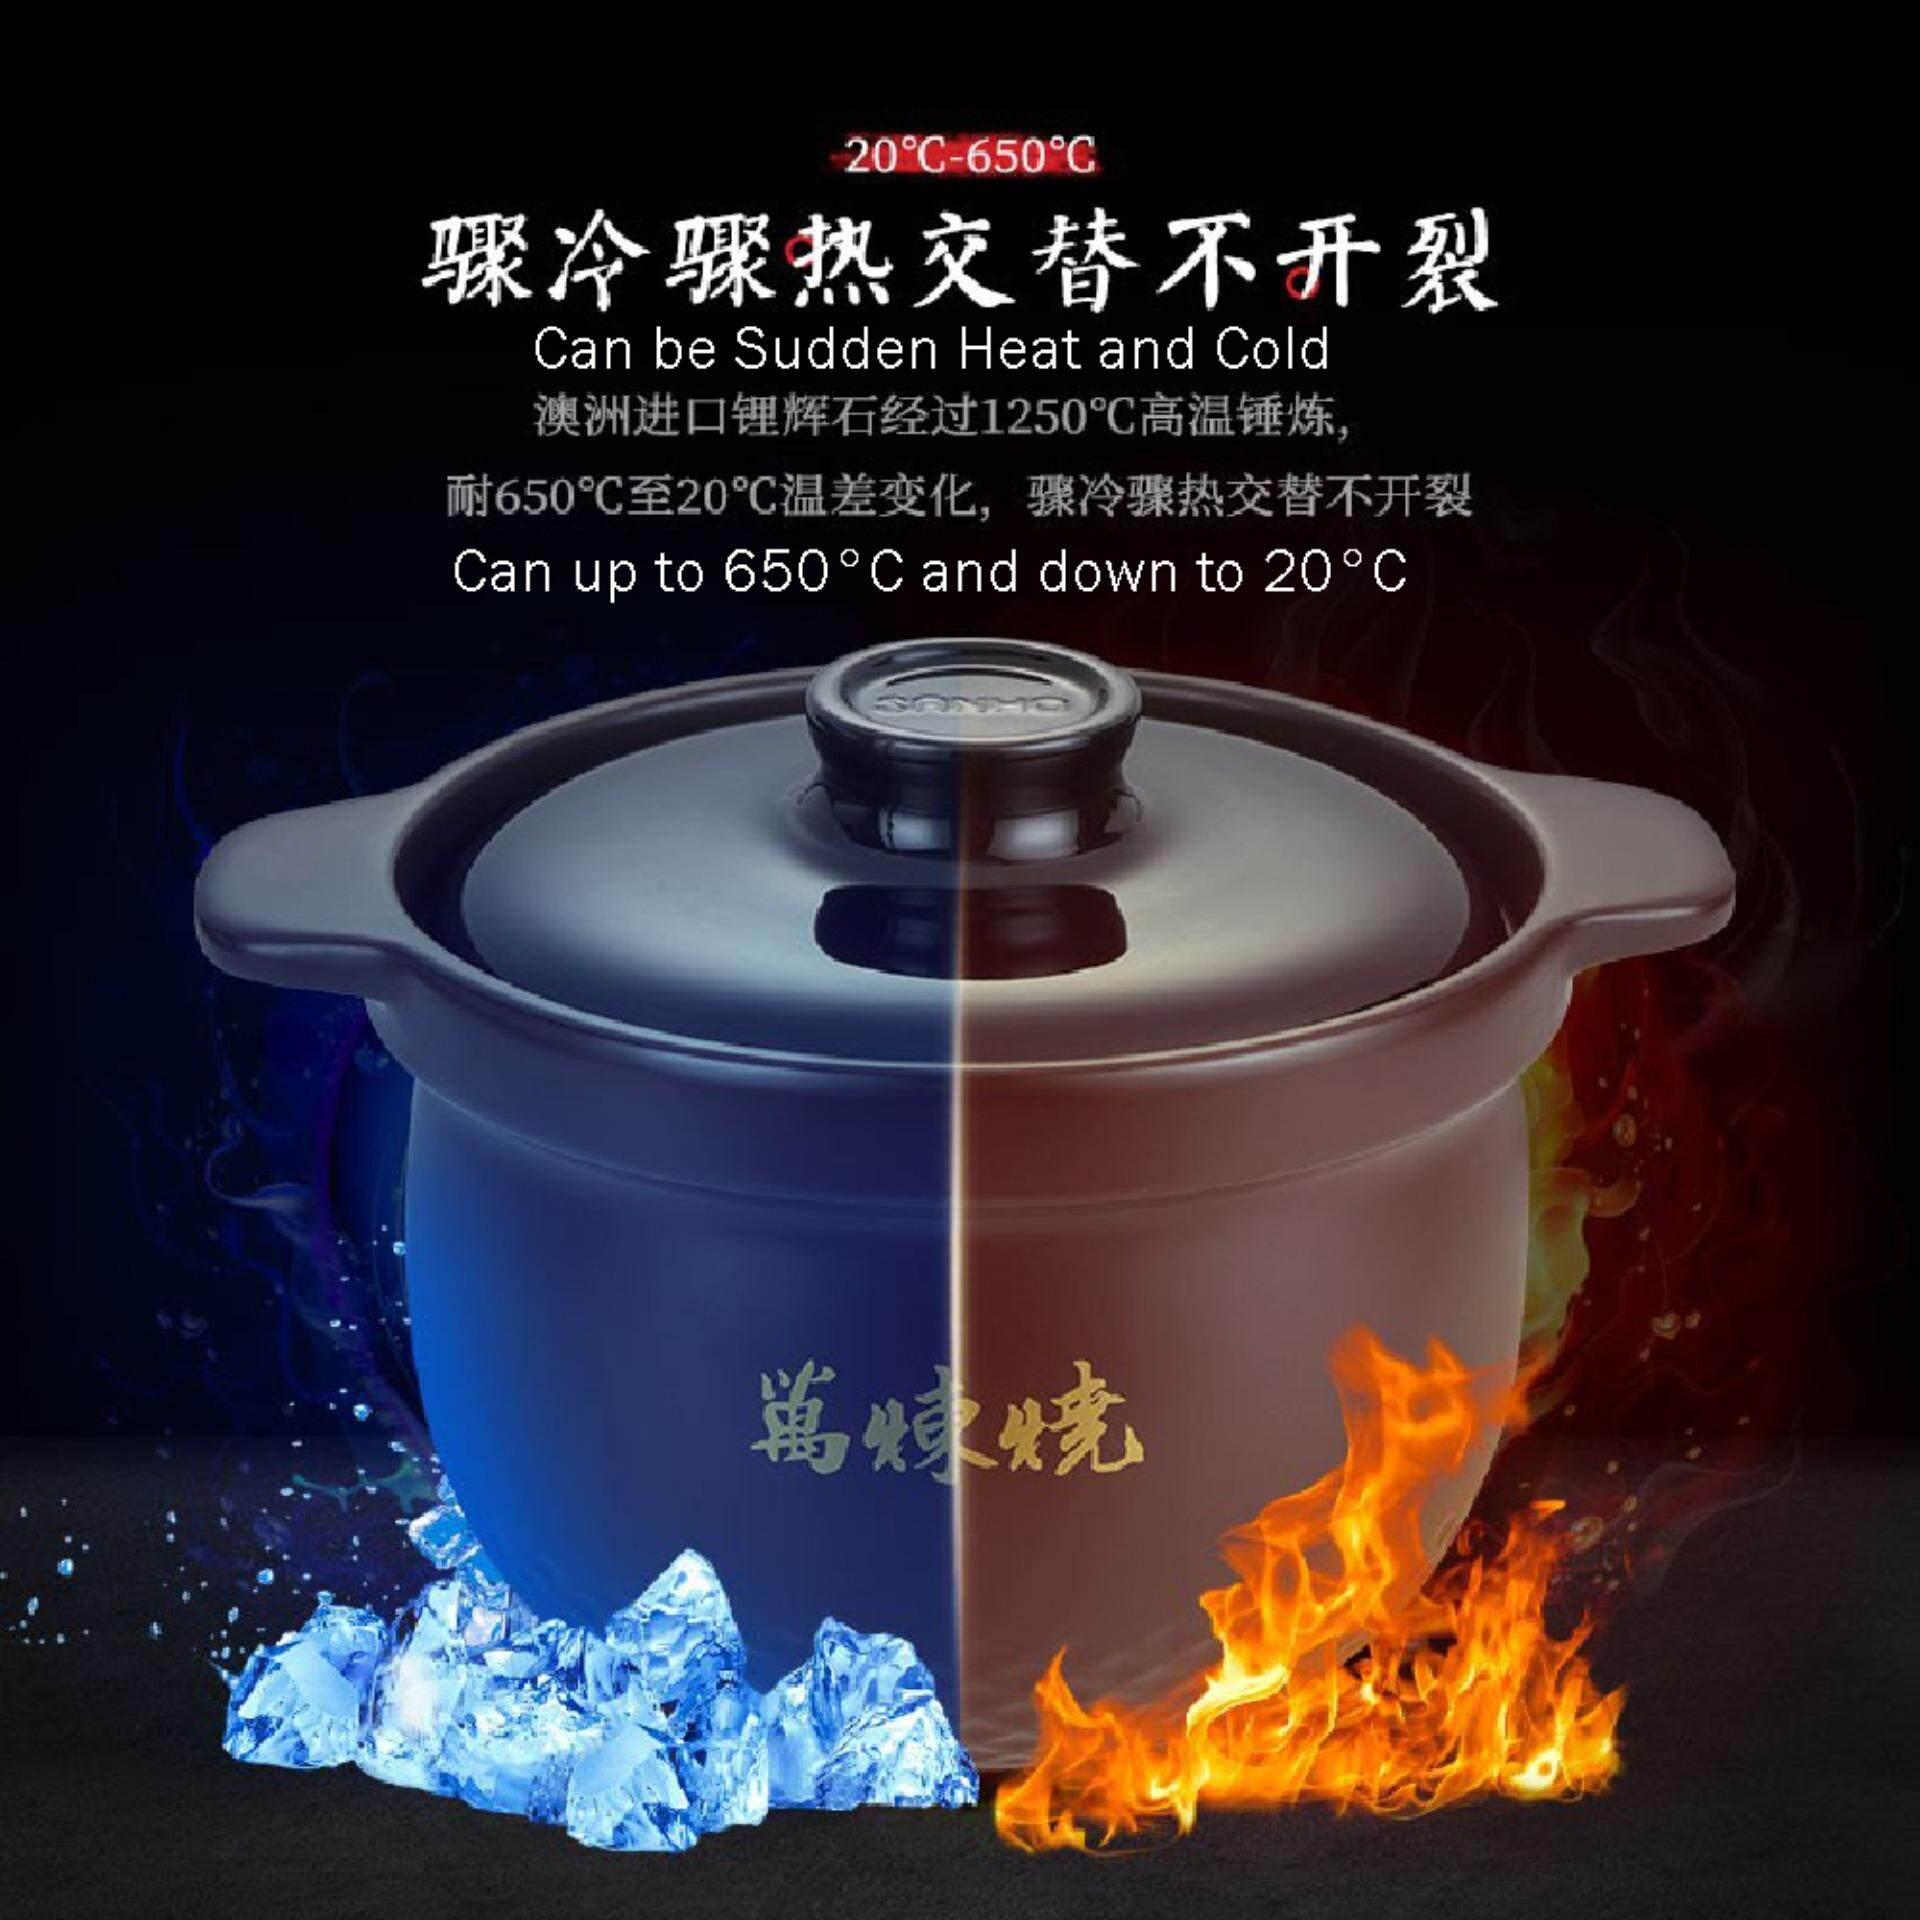 [Ready Stock] SANHO Kitchen Claypot Pot Stockpot Stew Cooking 4.5L Healthy Porcelain Pot Ceramic Pot